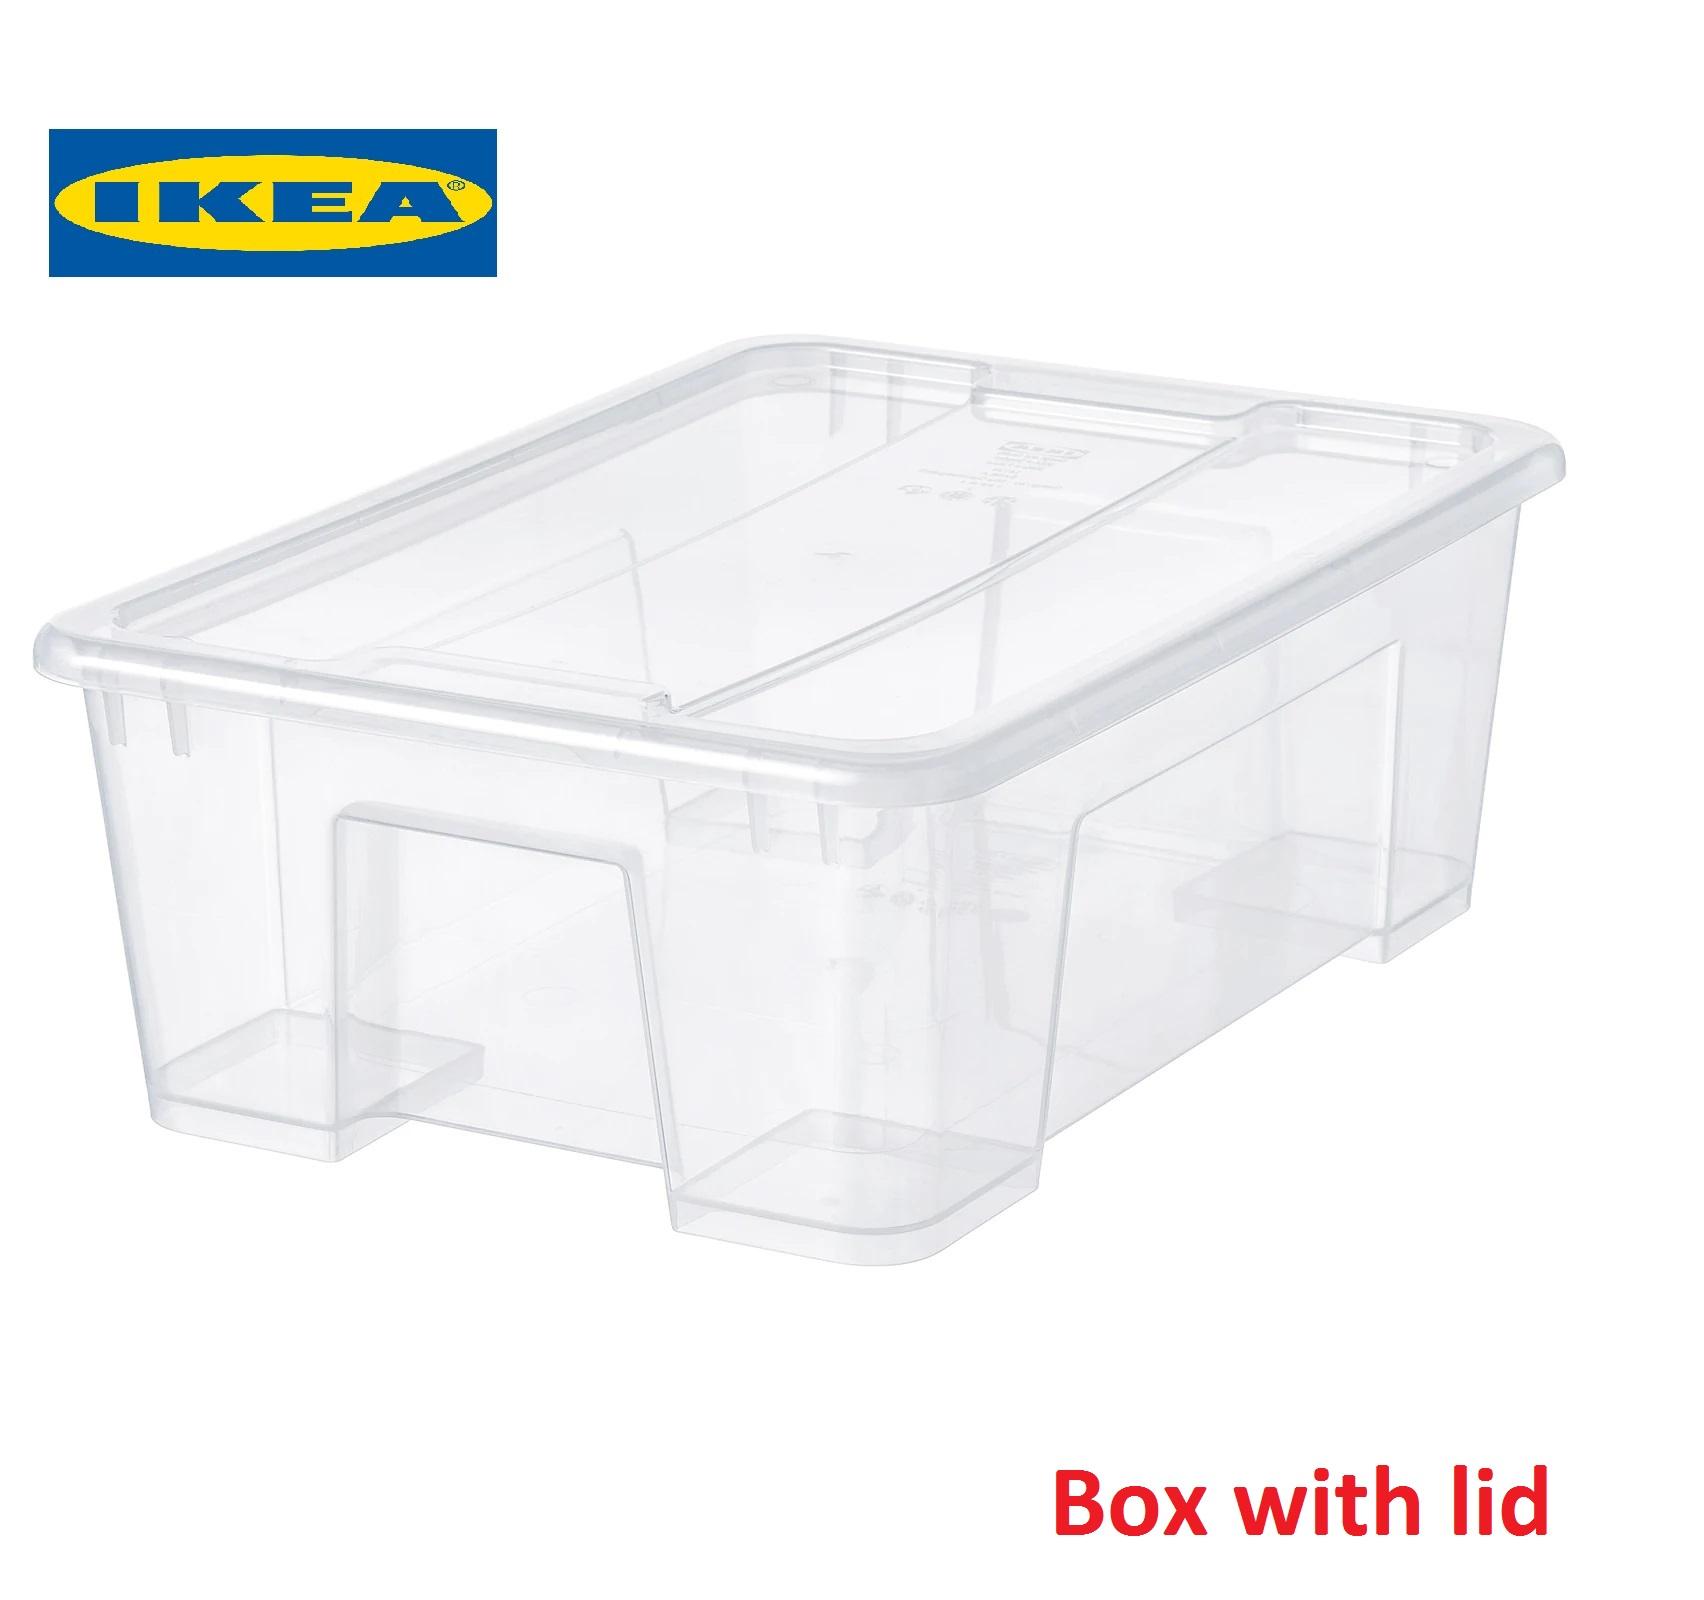 Buy IKEA Storage & Organisation at Best Prices Online in Pakistan - daraz.pk